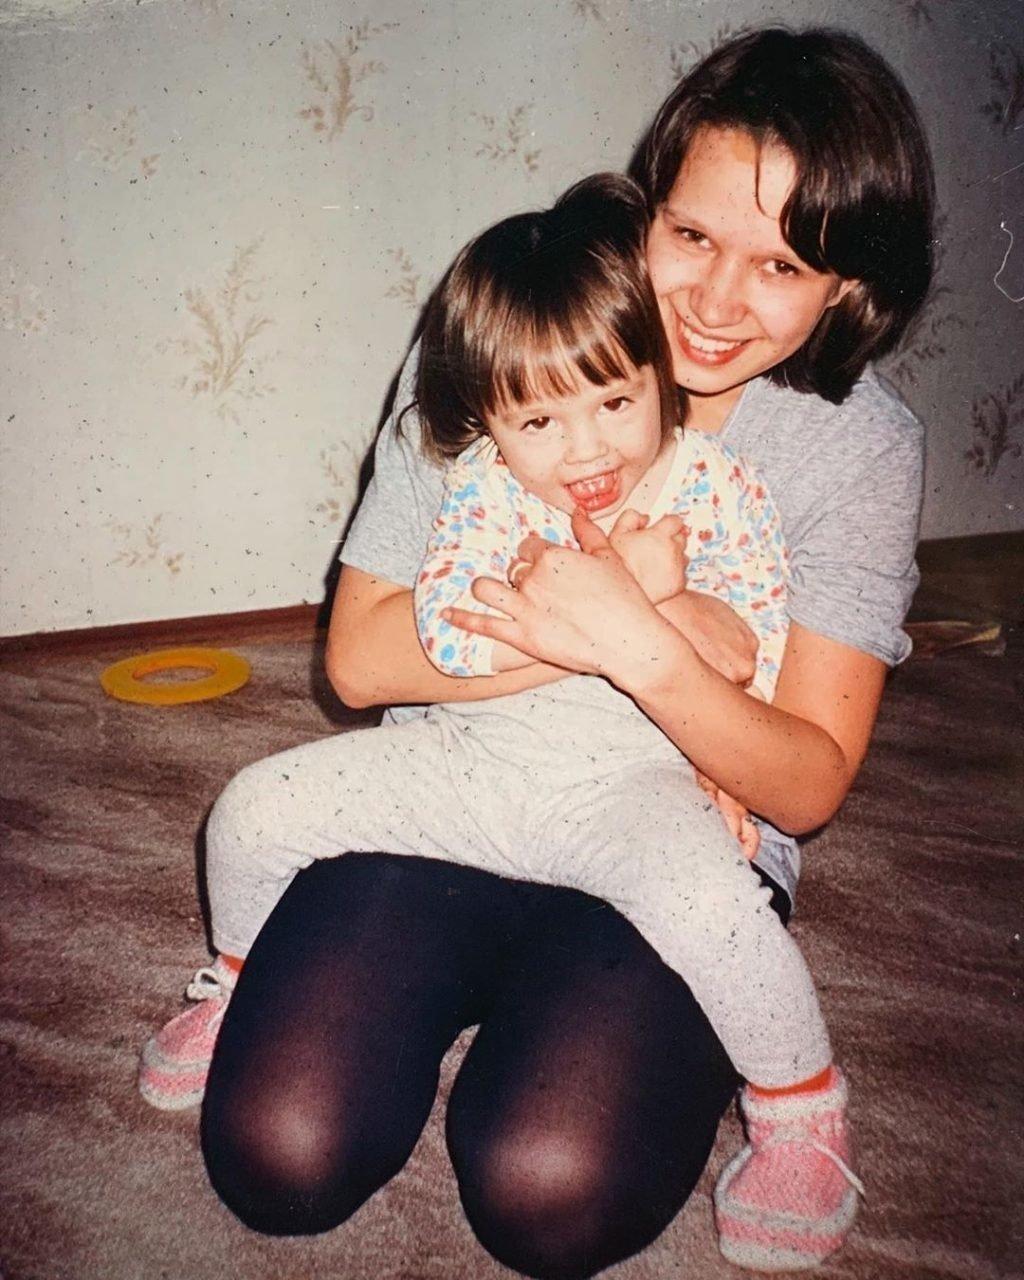 https://kumir.online/wp-content/uploads/2020/01/Даша-Instasamka12.jpg в детстве с мамой